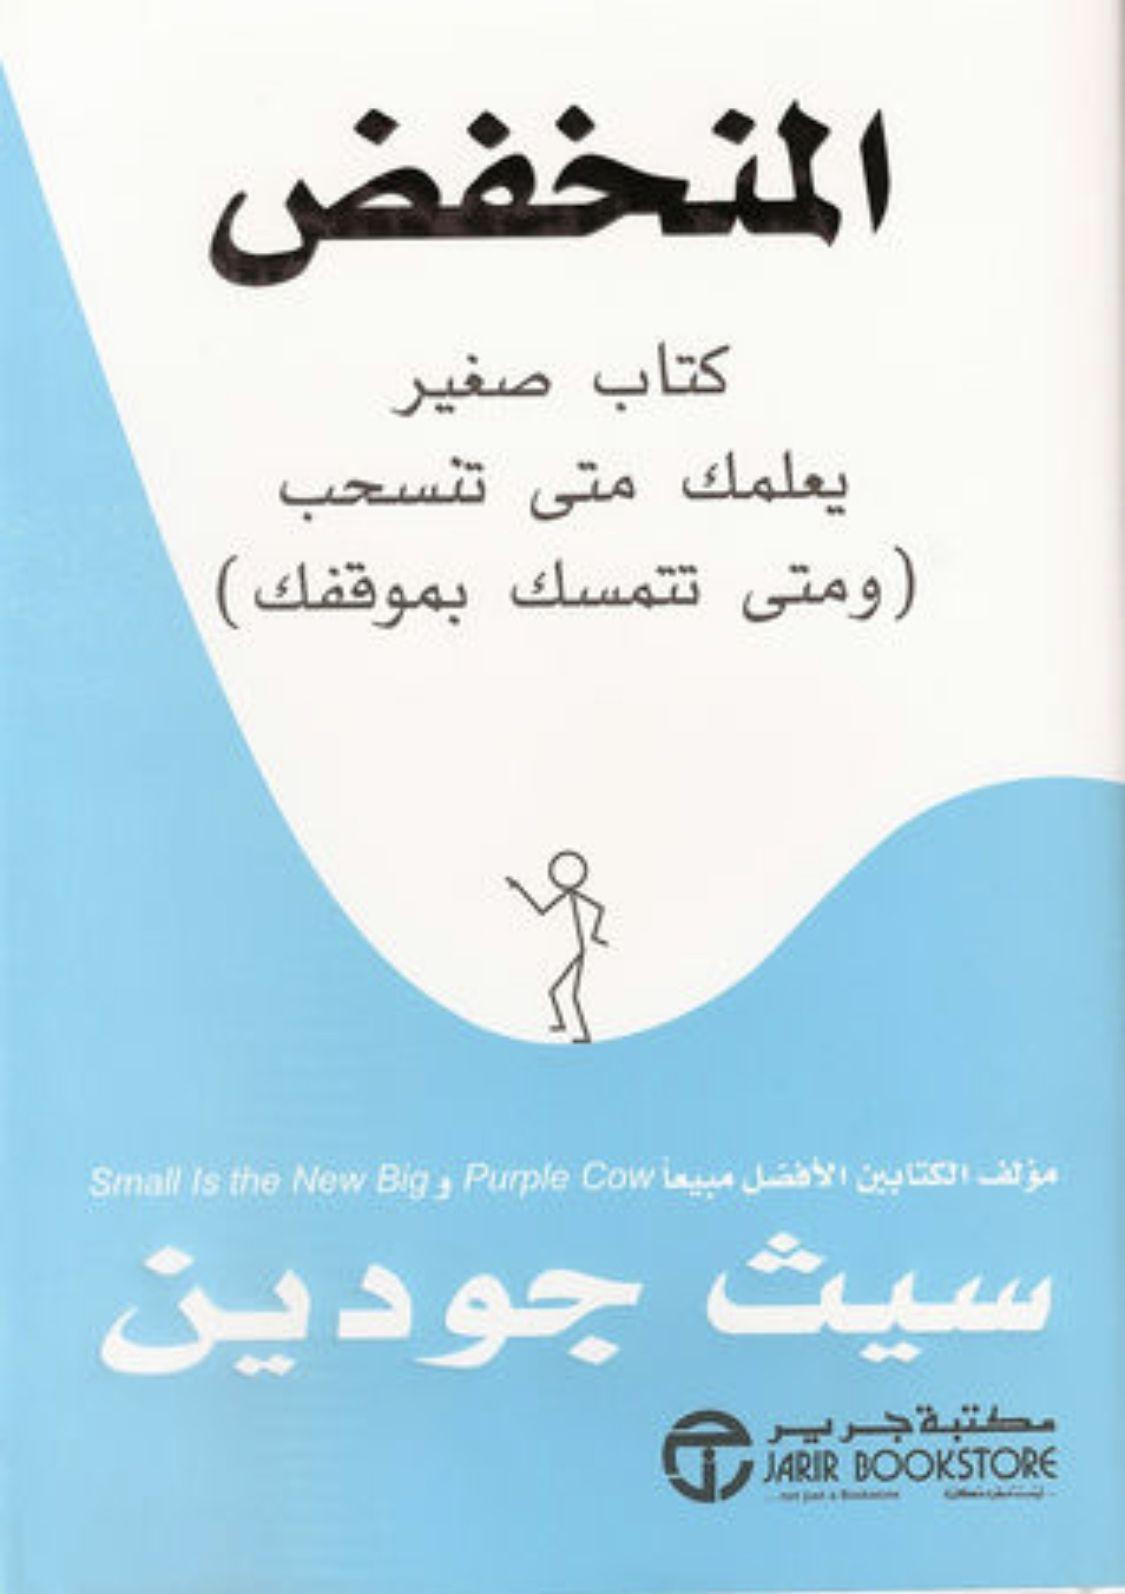 Pin By Meriem Megueni On My Book Shelf Books Philosophy Books Inspirational Books